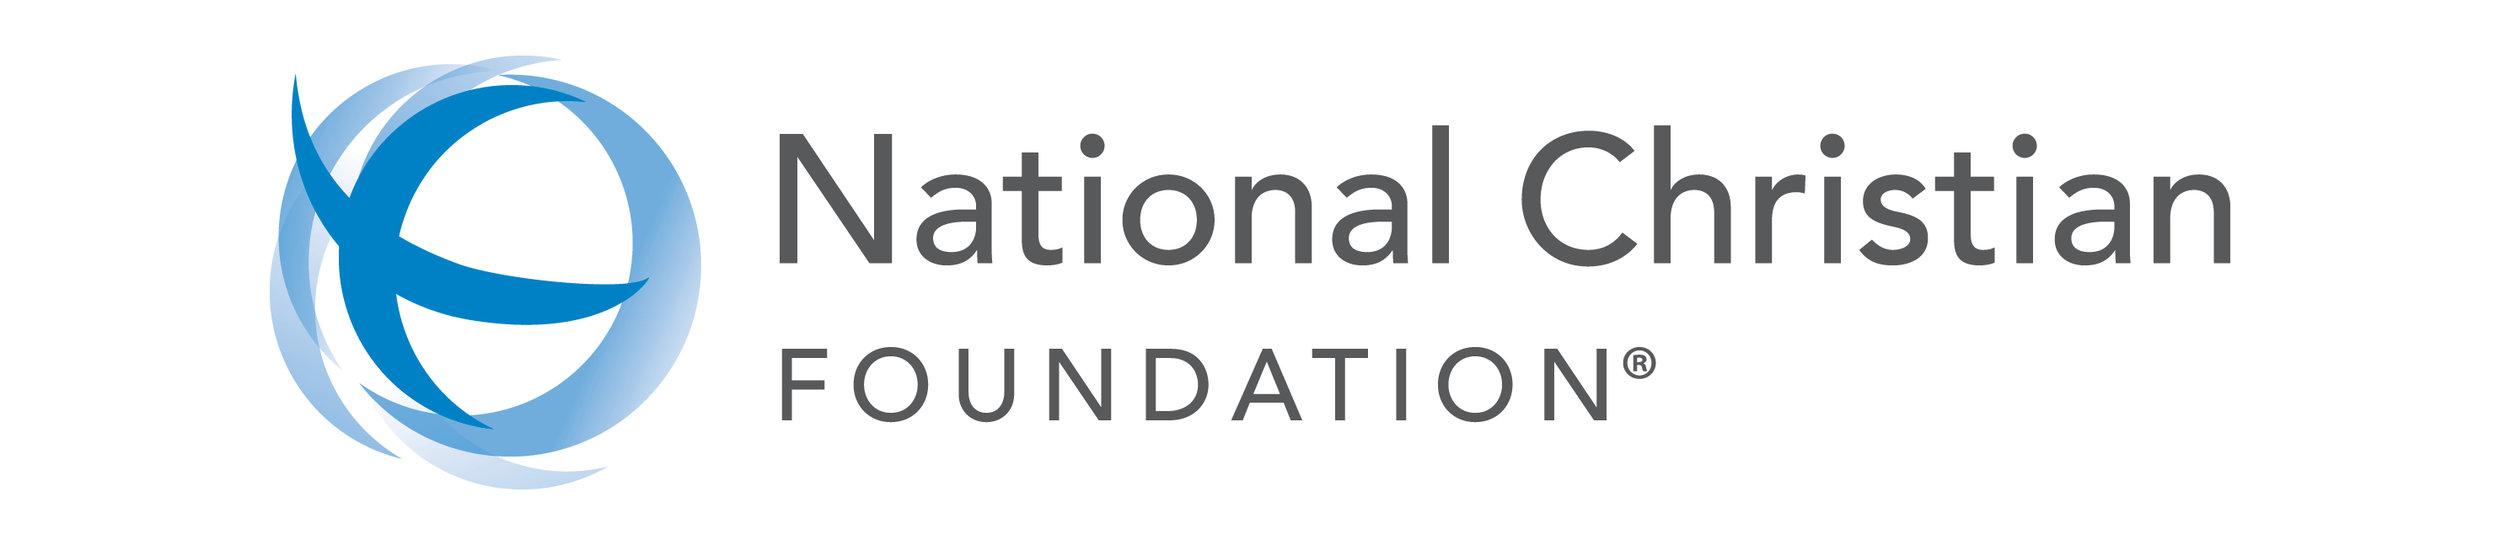 NCF-logo.jpg